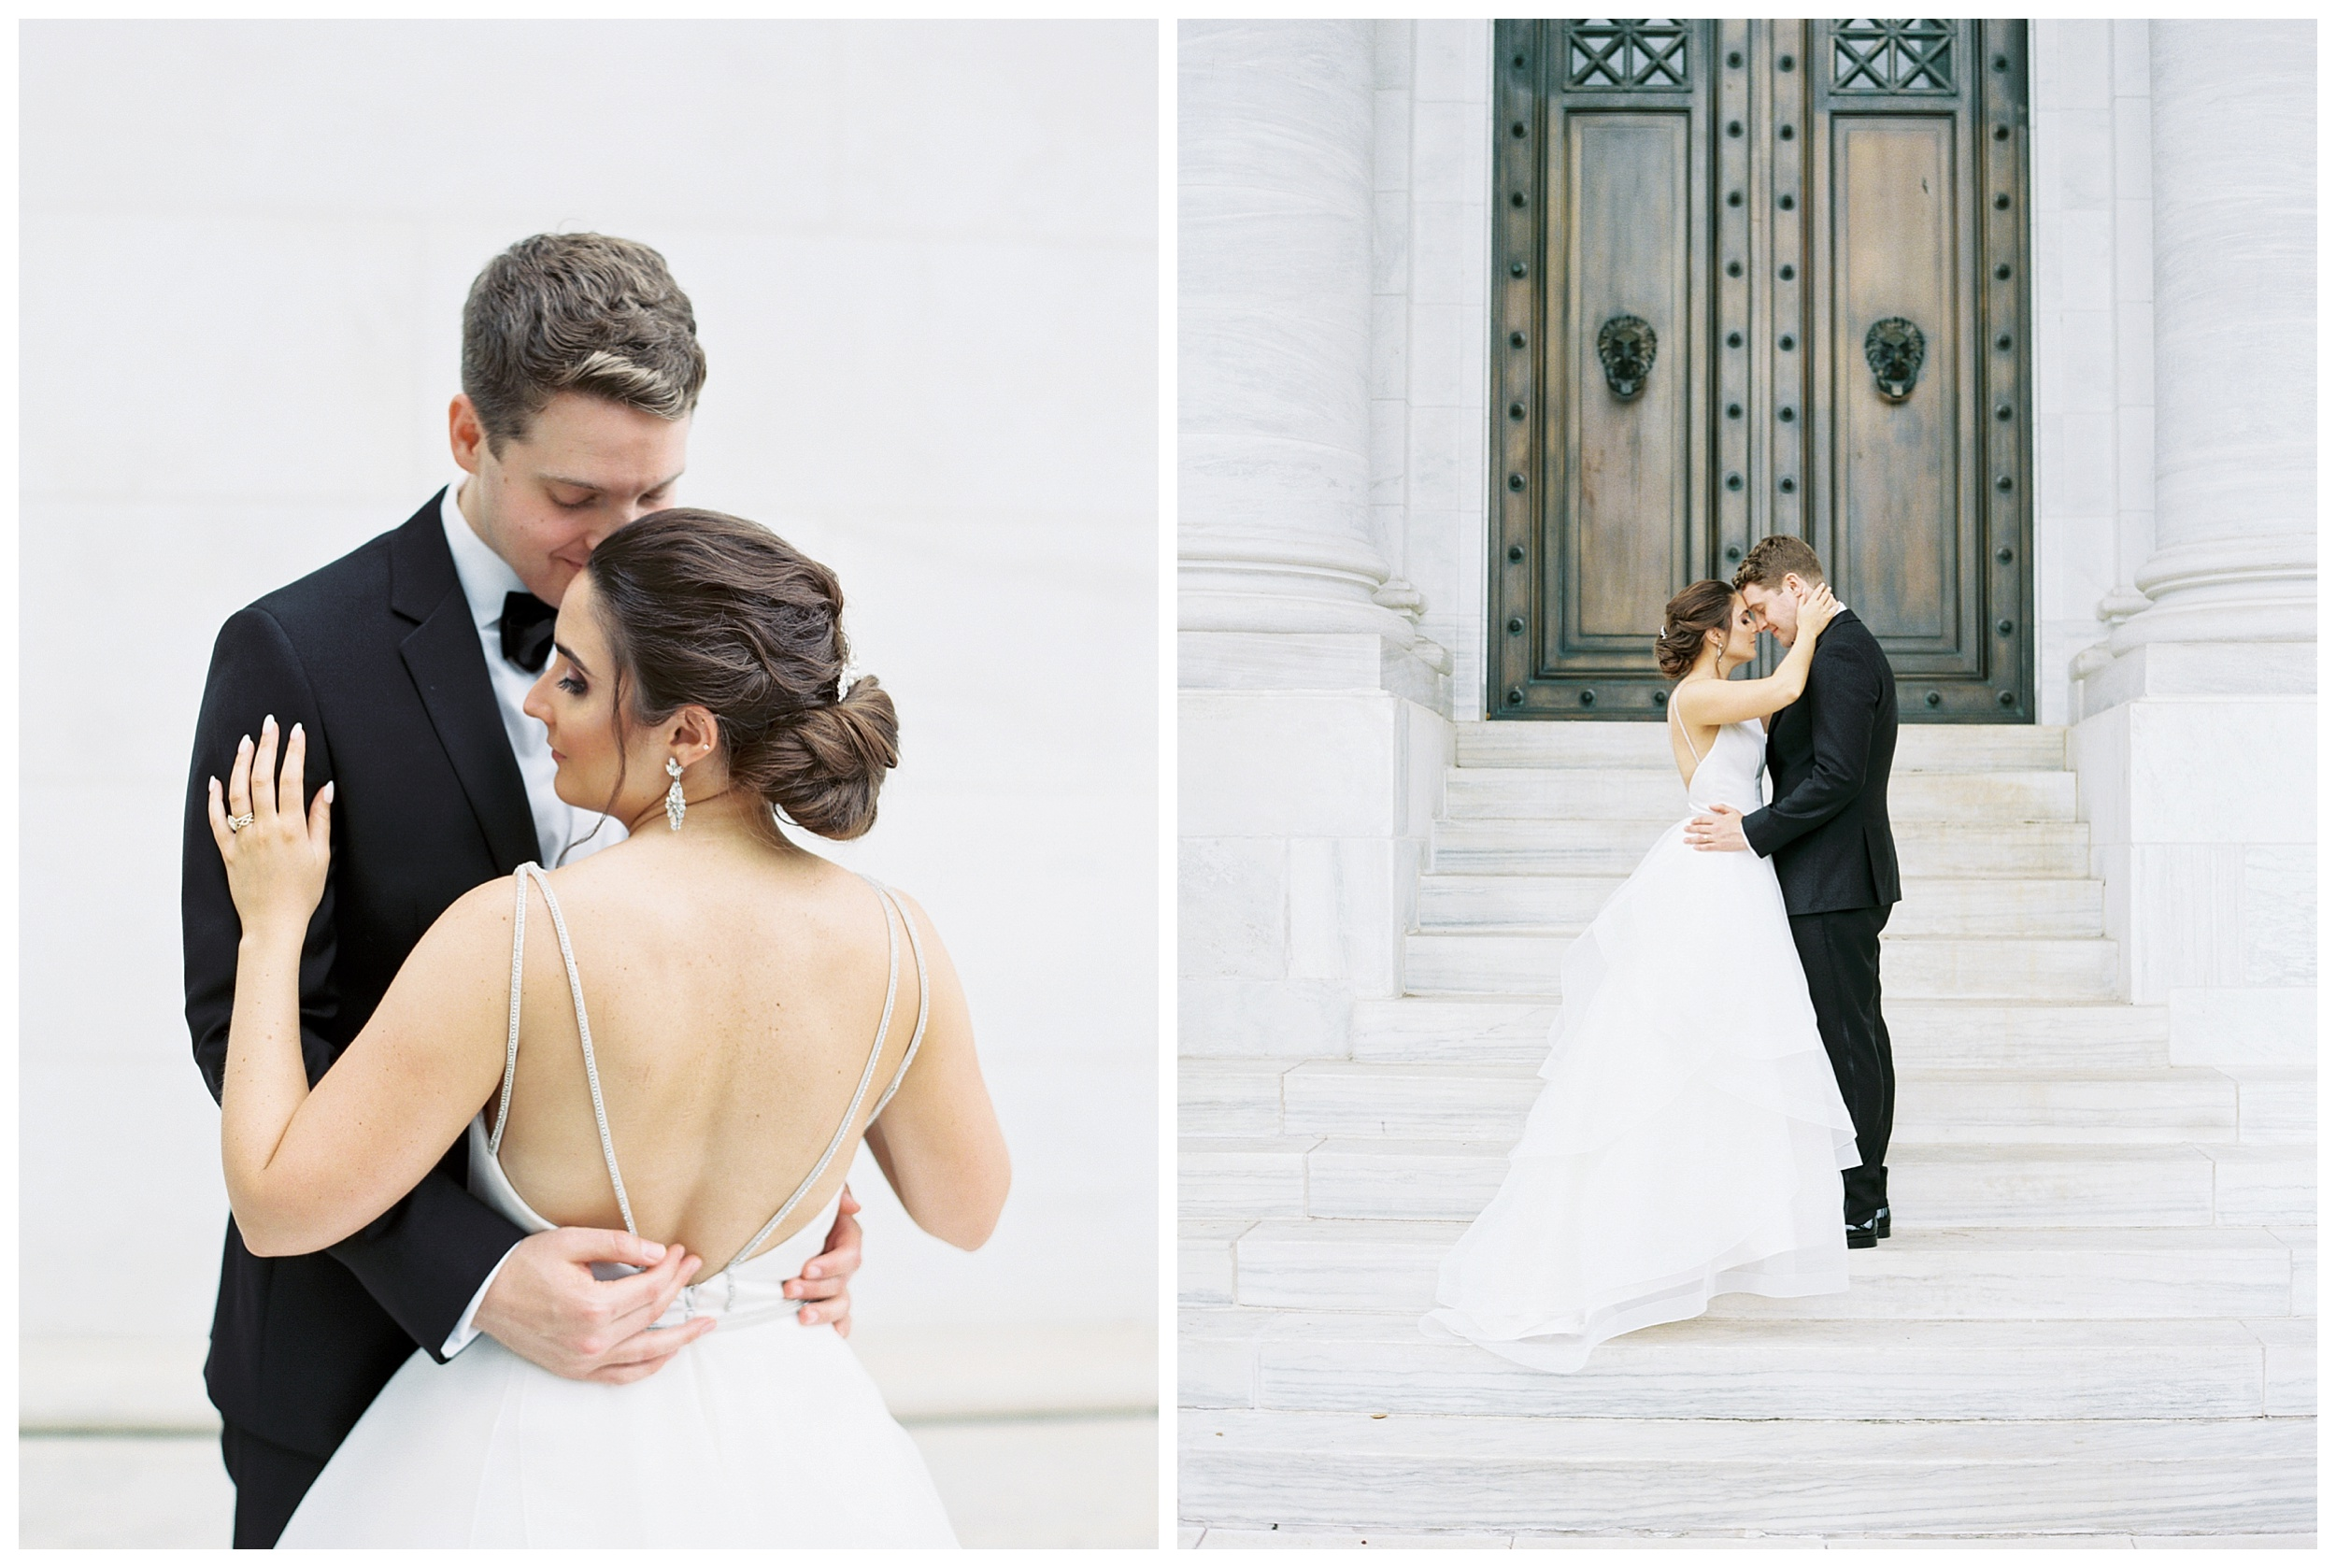 DAR Constitution Hall Wedding Wedding | Daughters of the American Revolution Wedding | District of Columbia Film Wedding Photographer Kir Tuben_0118.jpg